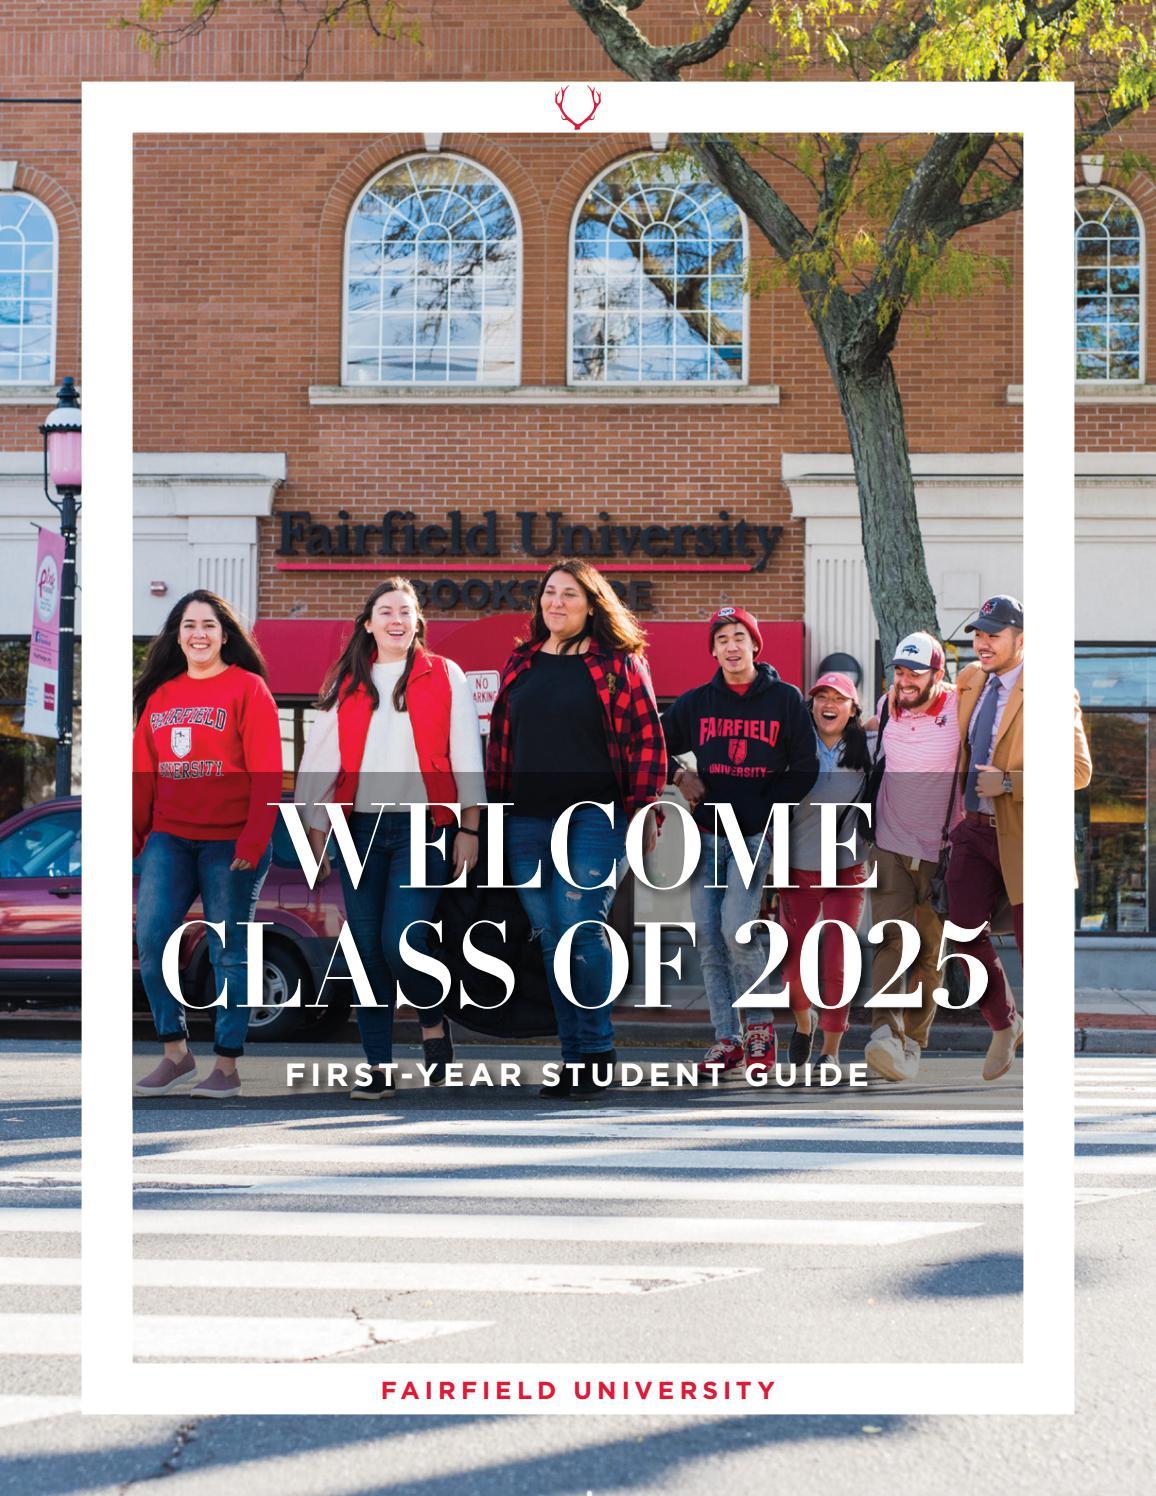 Fairfield University Academic Calendar 2022.New Student Guide Spring 2021 By Fairfield University Issuu